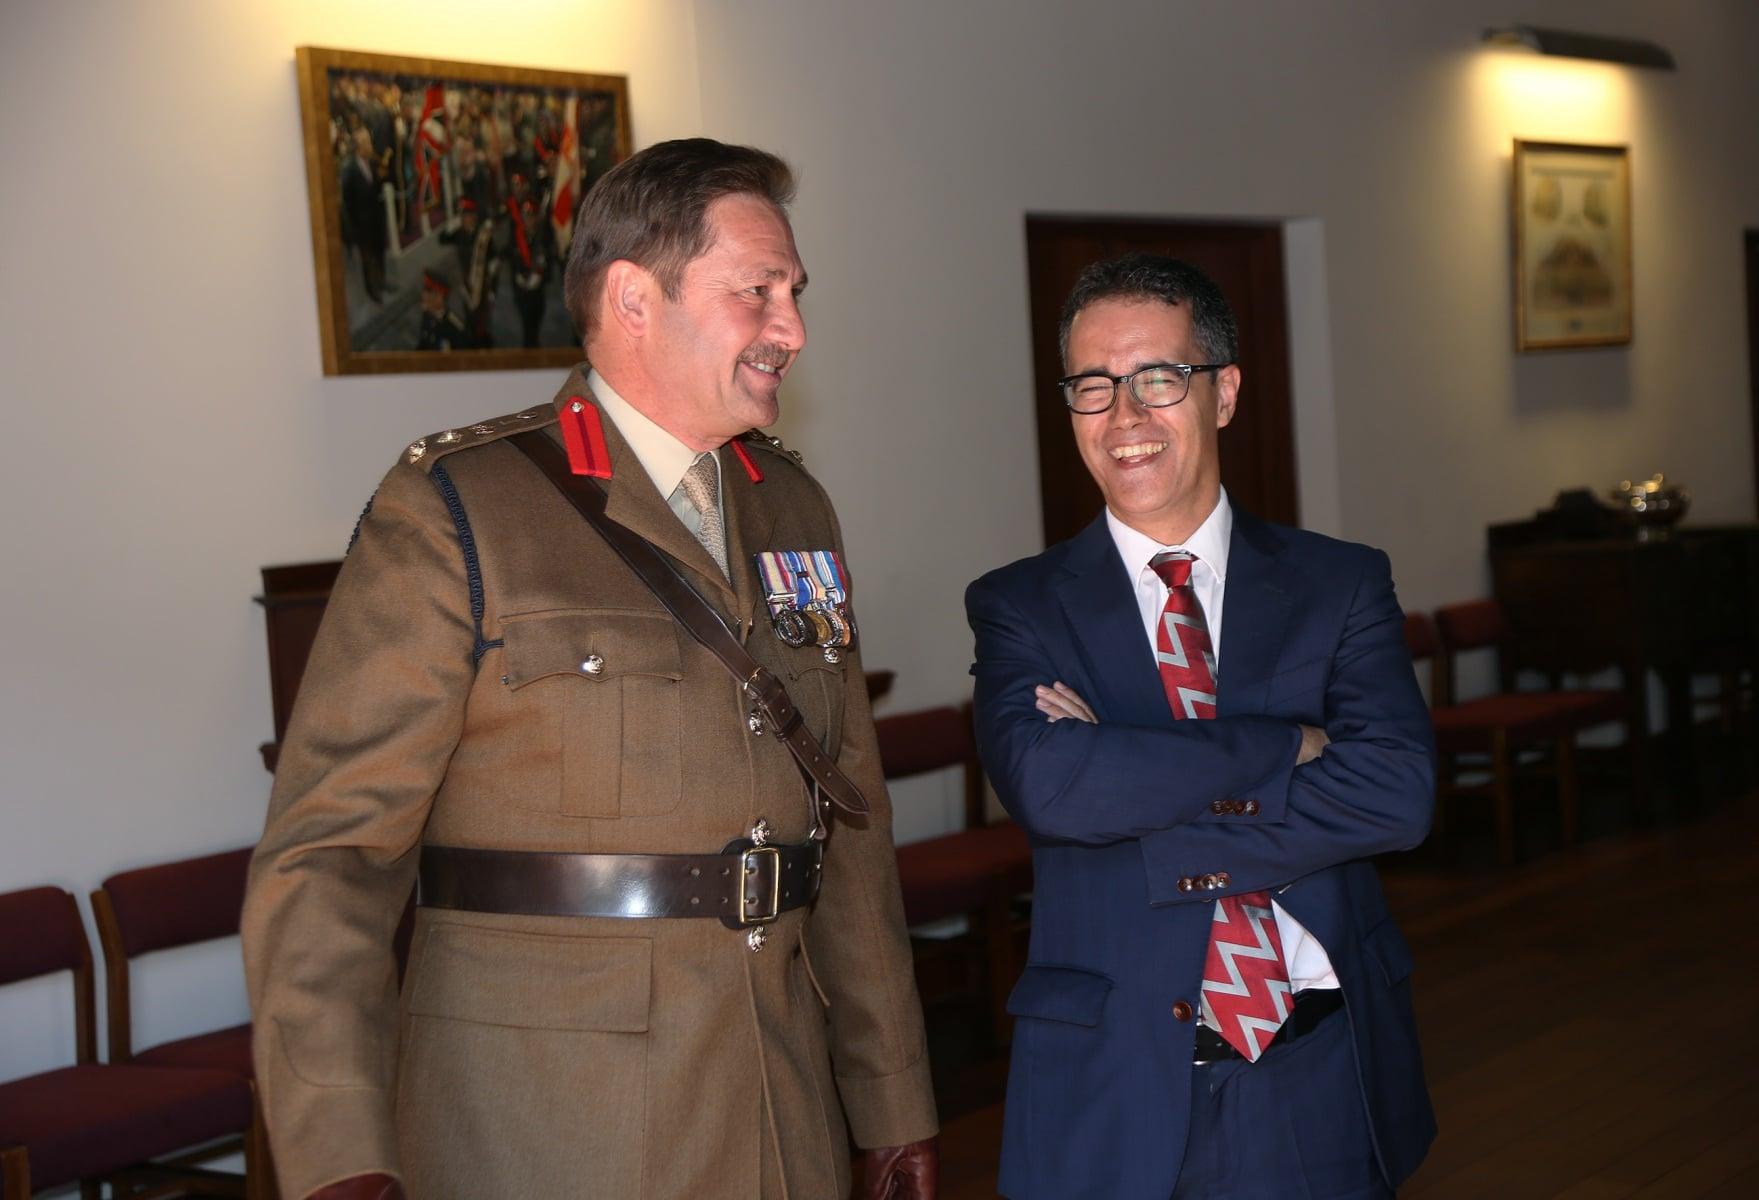 2-jun-2016-salvas-en-gibraltar-honor-al-aniversario-de-coronacin-de-la-reina_27417184165_o